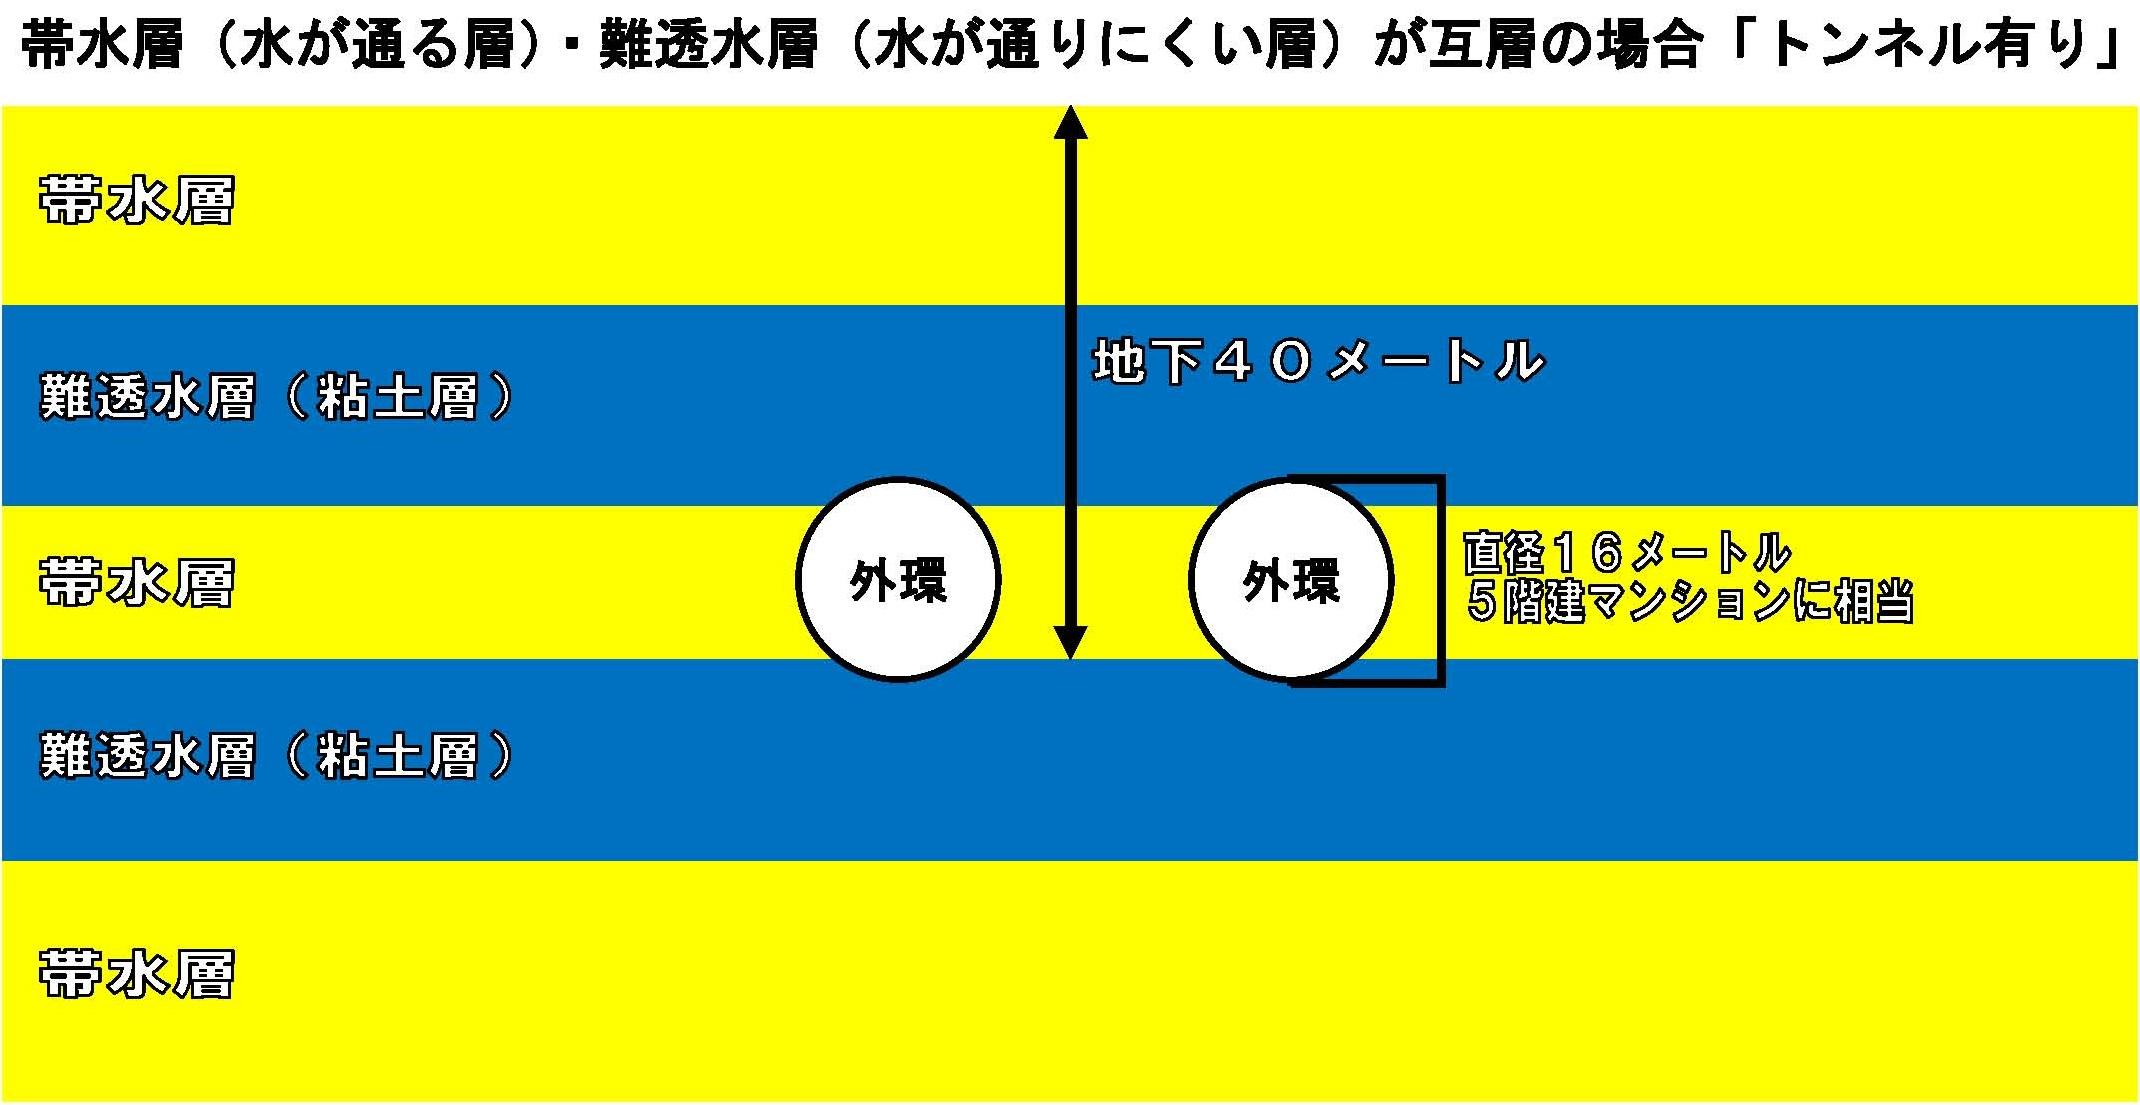 http://yamadakohei.jp/blog_upfile/%E5%B8%AF%E6%B0%B4%E5%B1%A4%E8%B3%87%E6%96%992.jpg